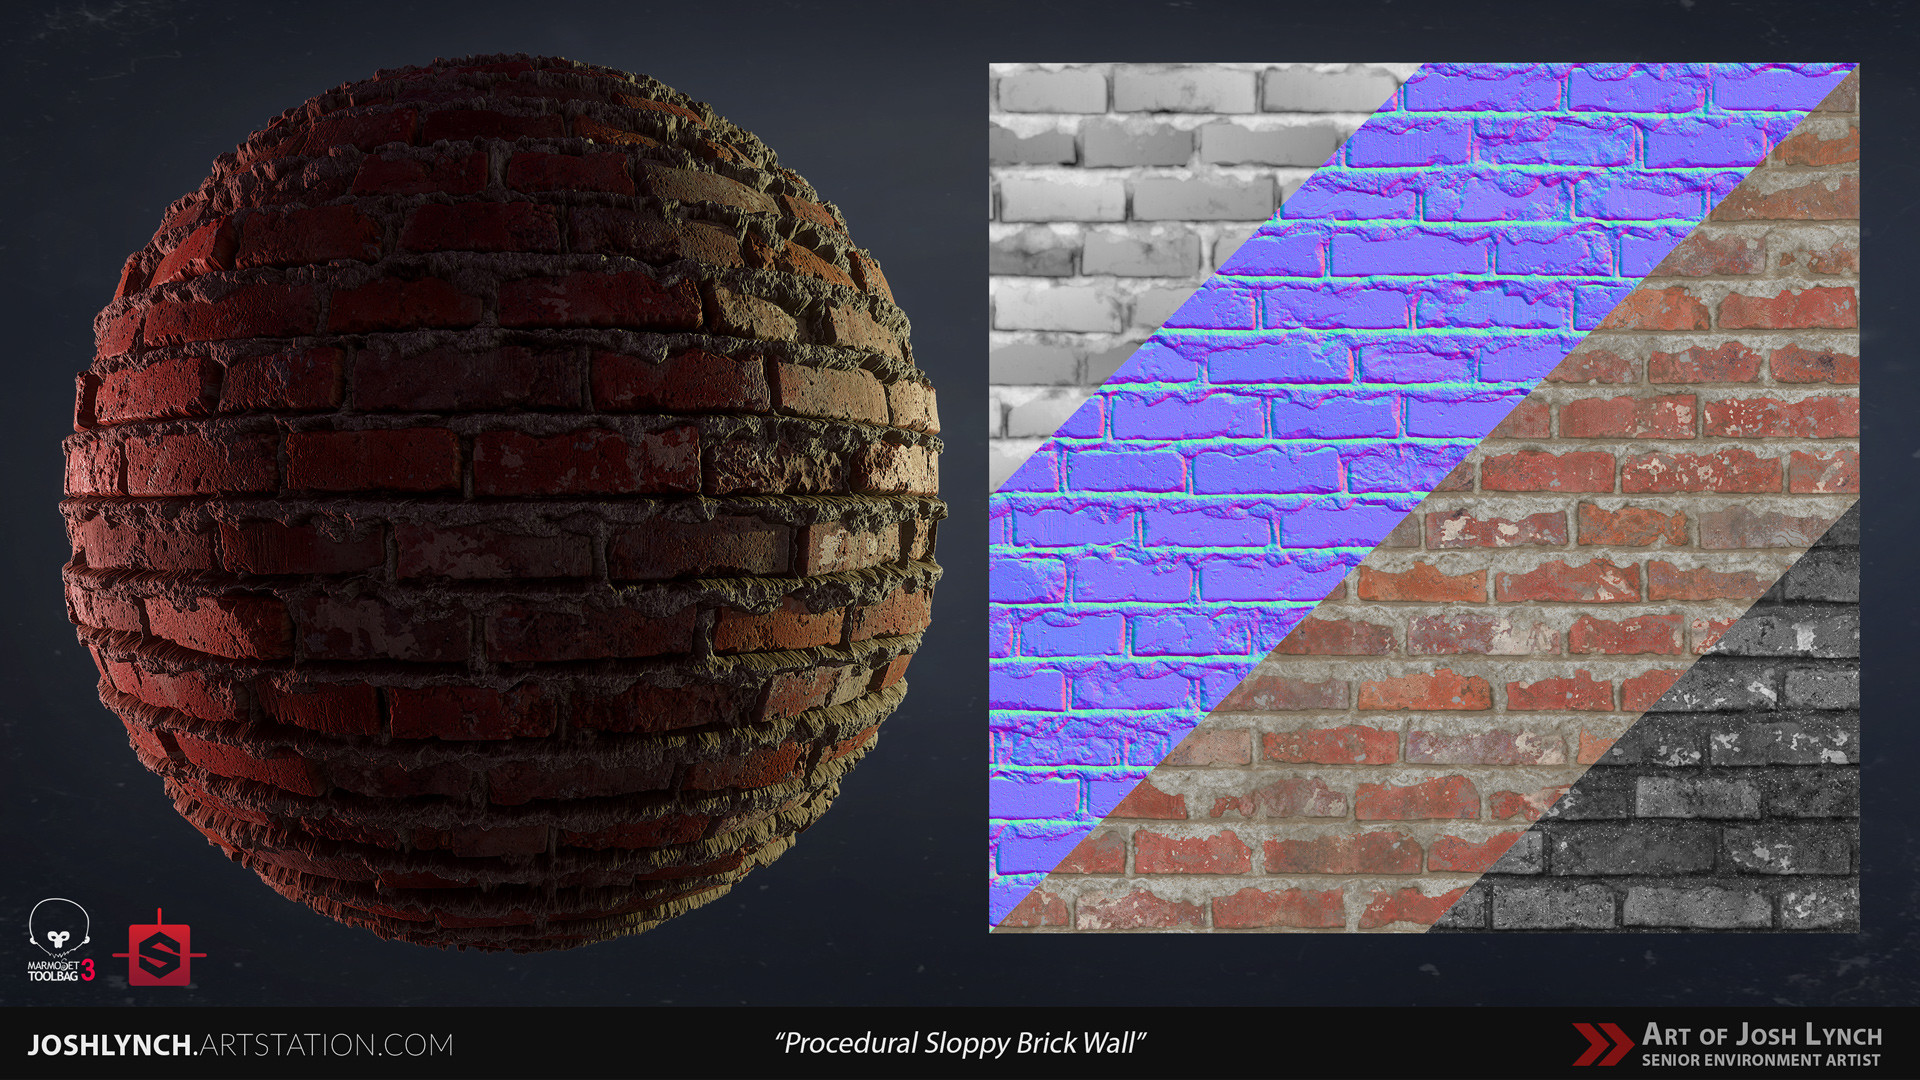 Joshua lynch wall brick sloppy 02 comp sphere 04